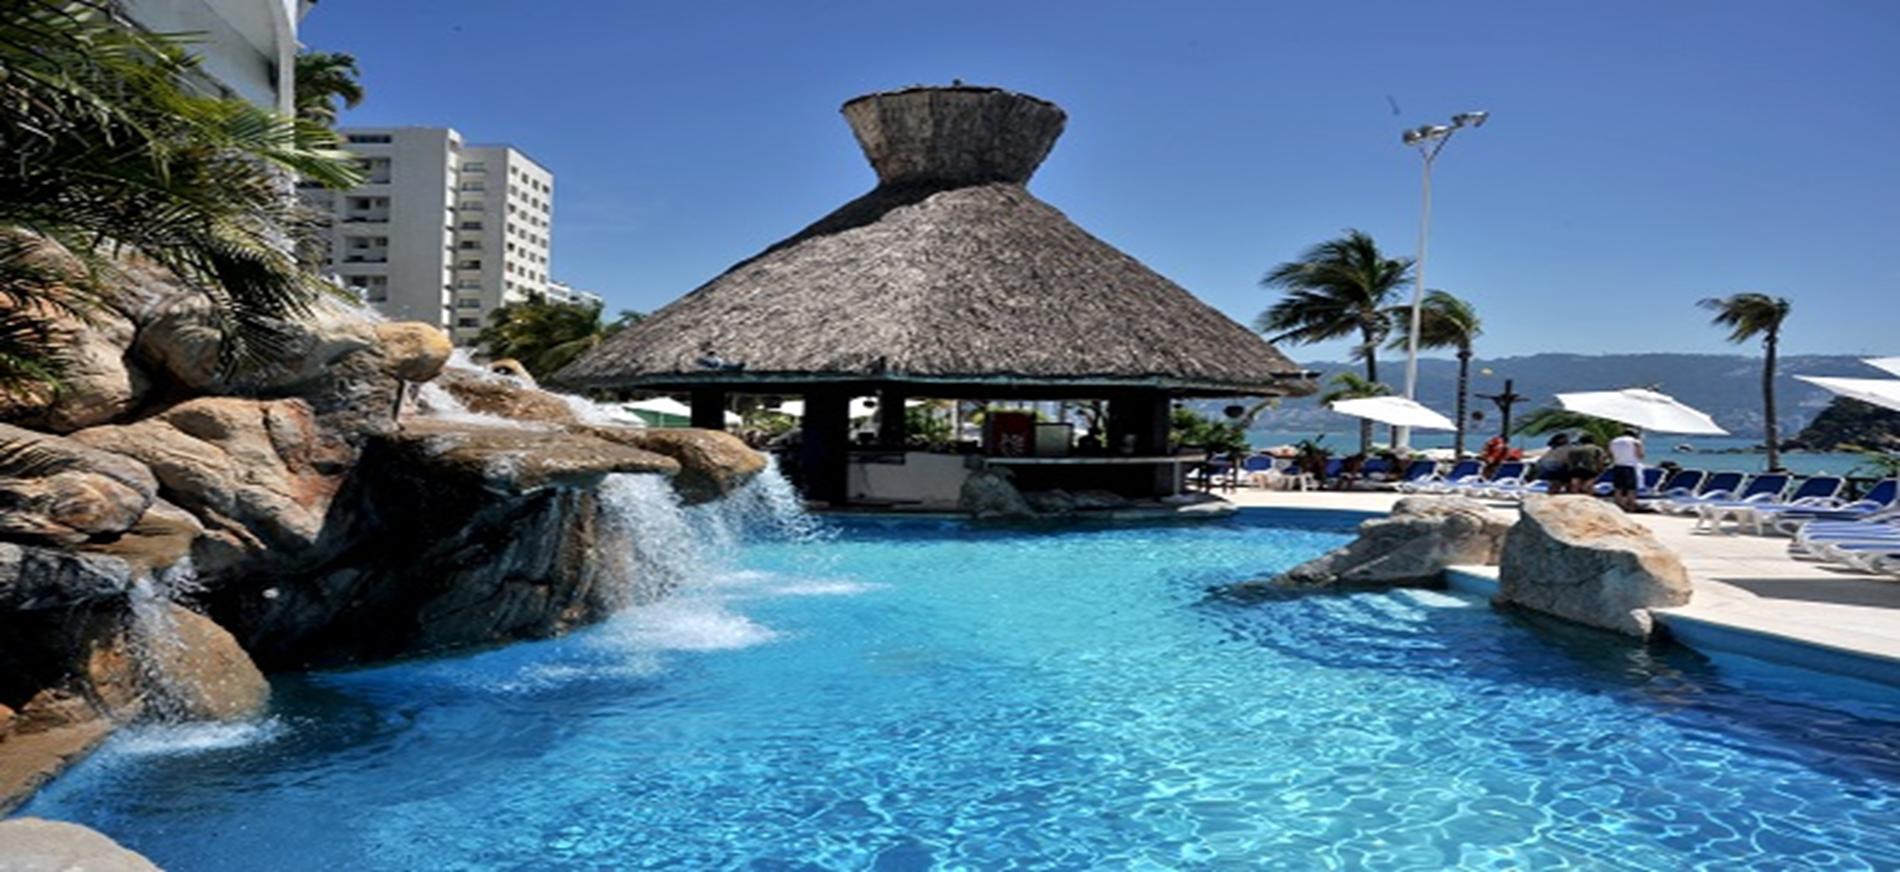 HS HOTSSON Smart Acapulco - acapulco best hotels